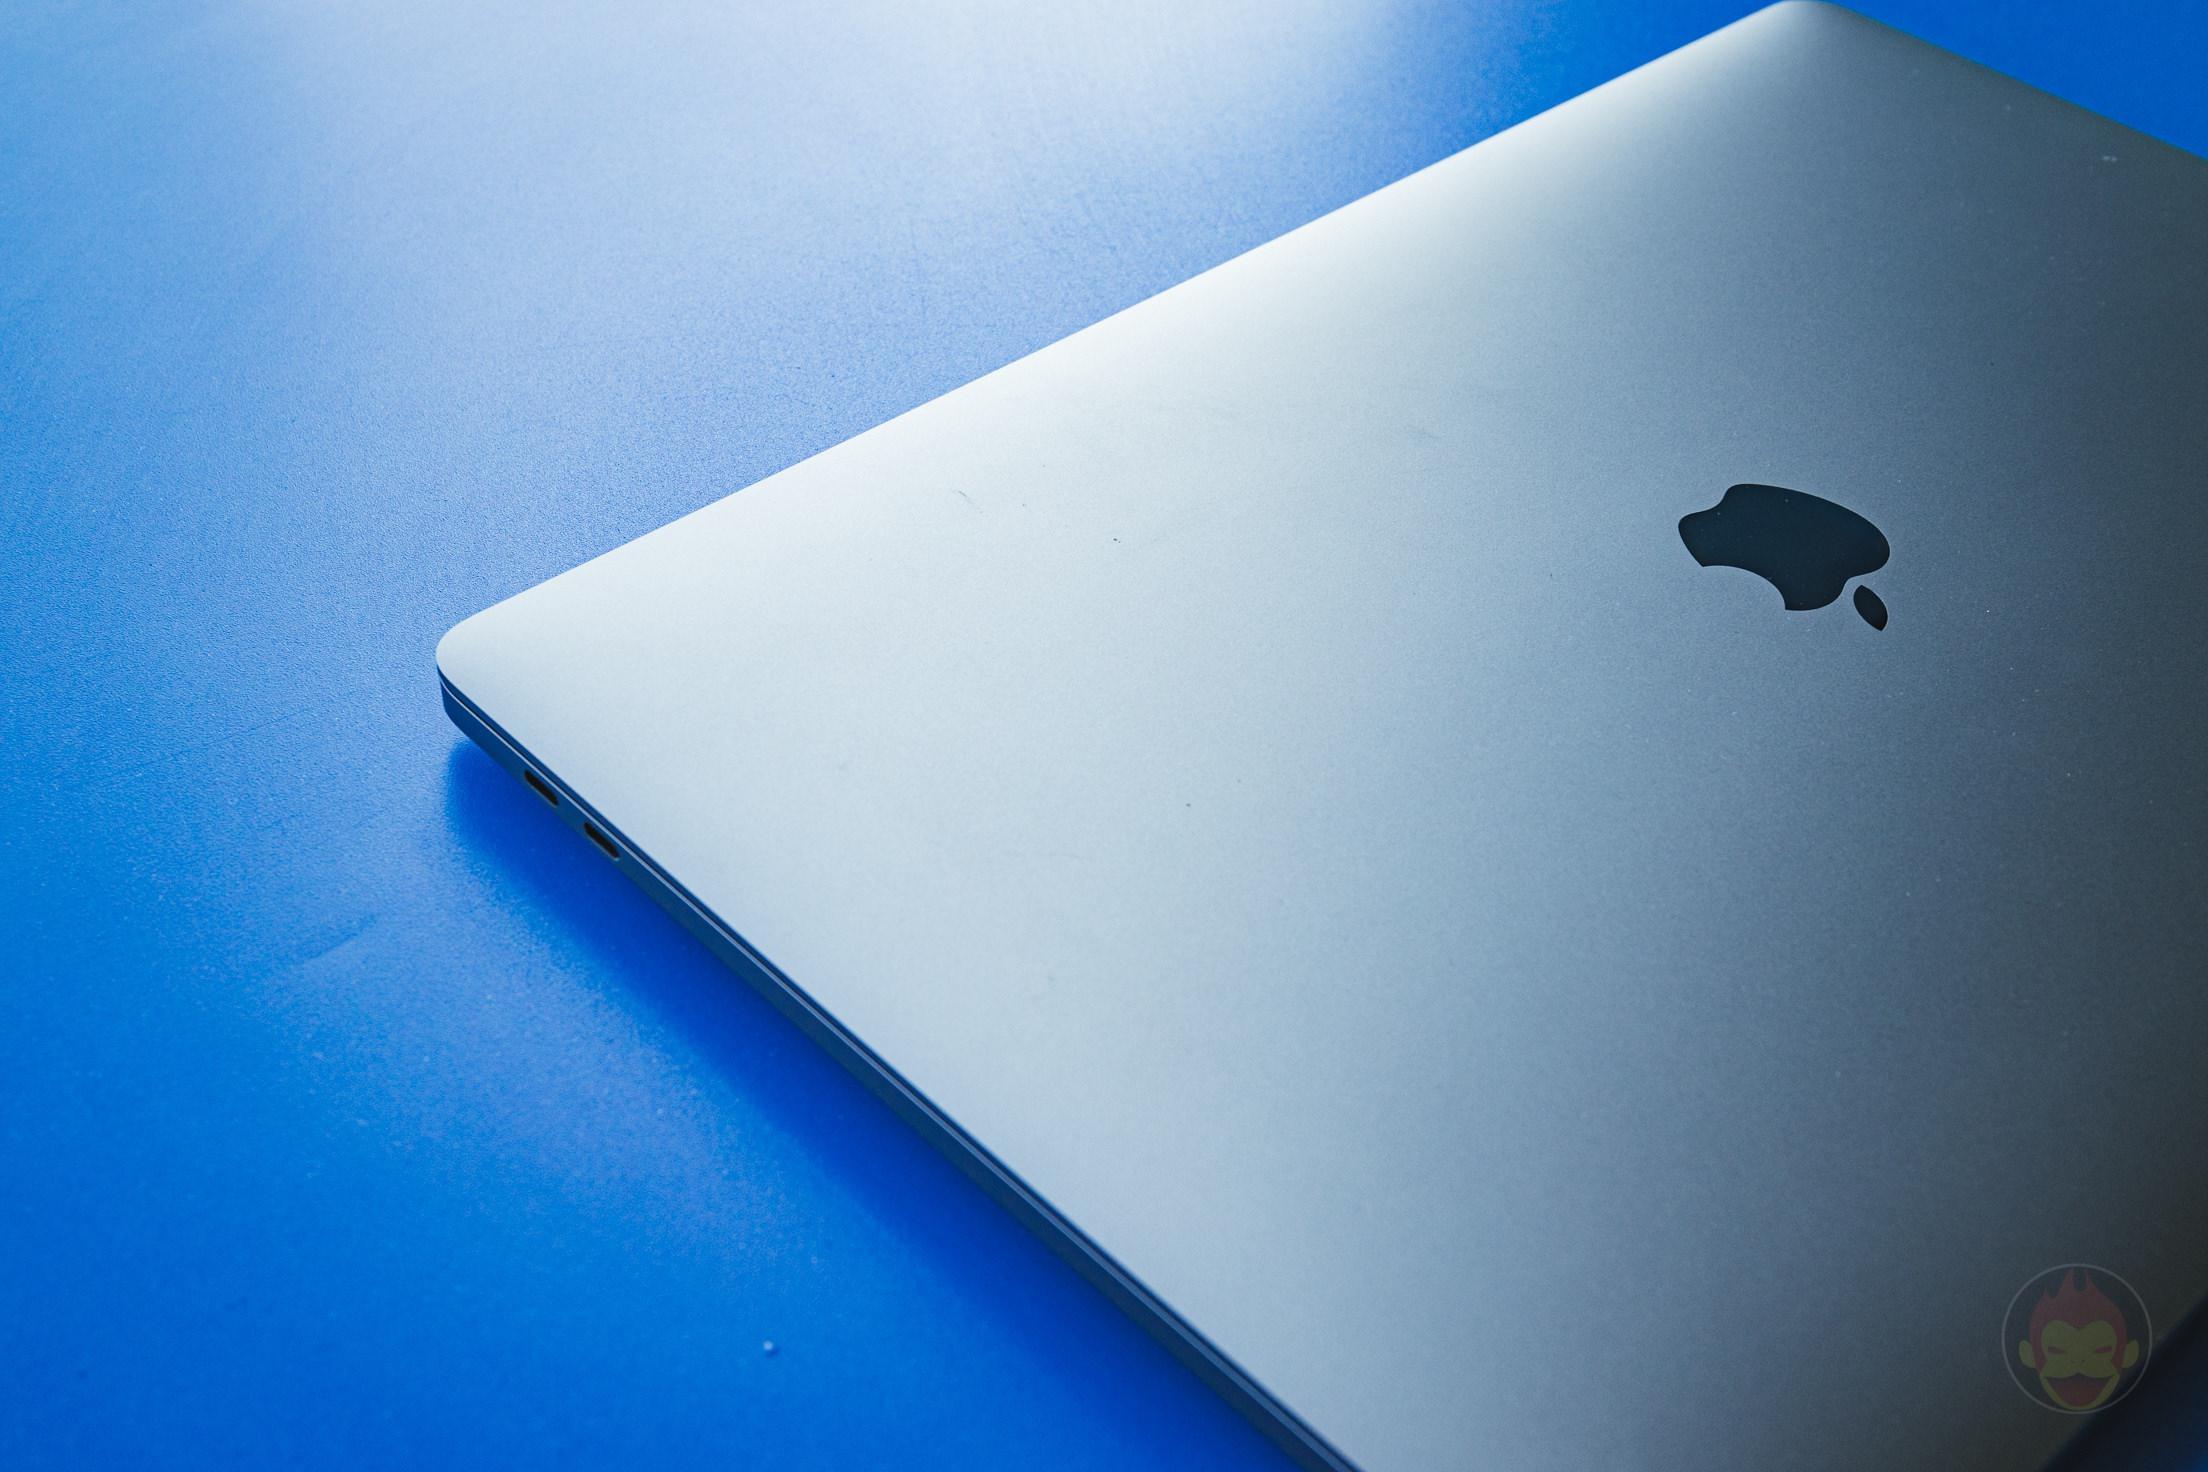 MacBook-Pro-2019-16inch-Review-BlueBackground-05.jpg